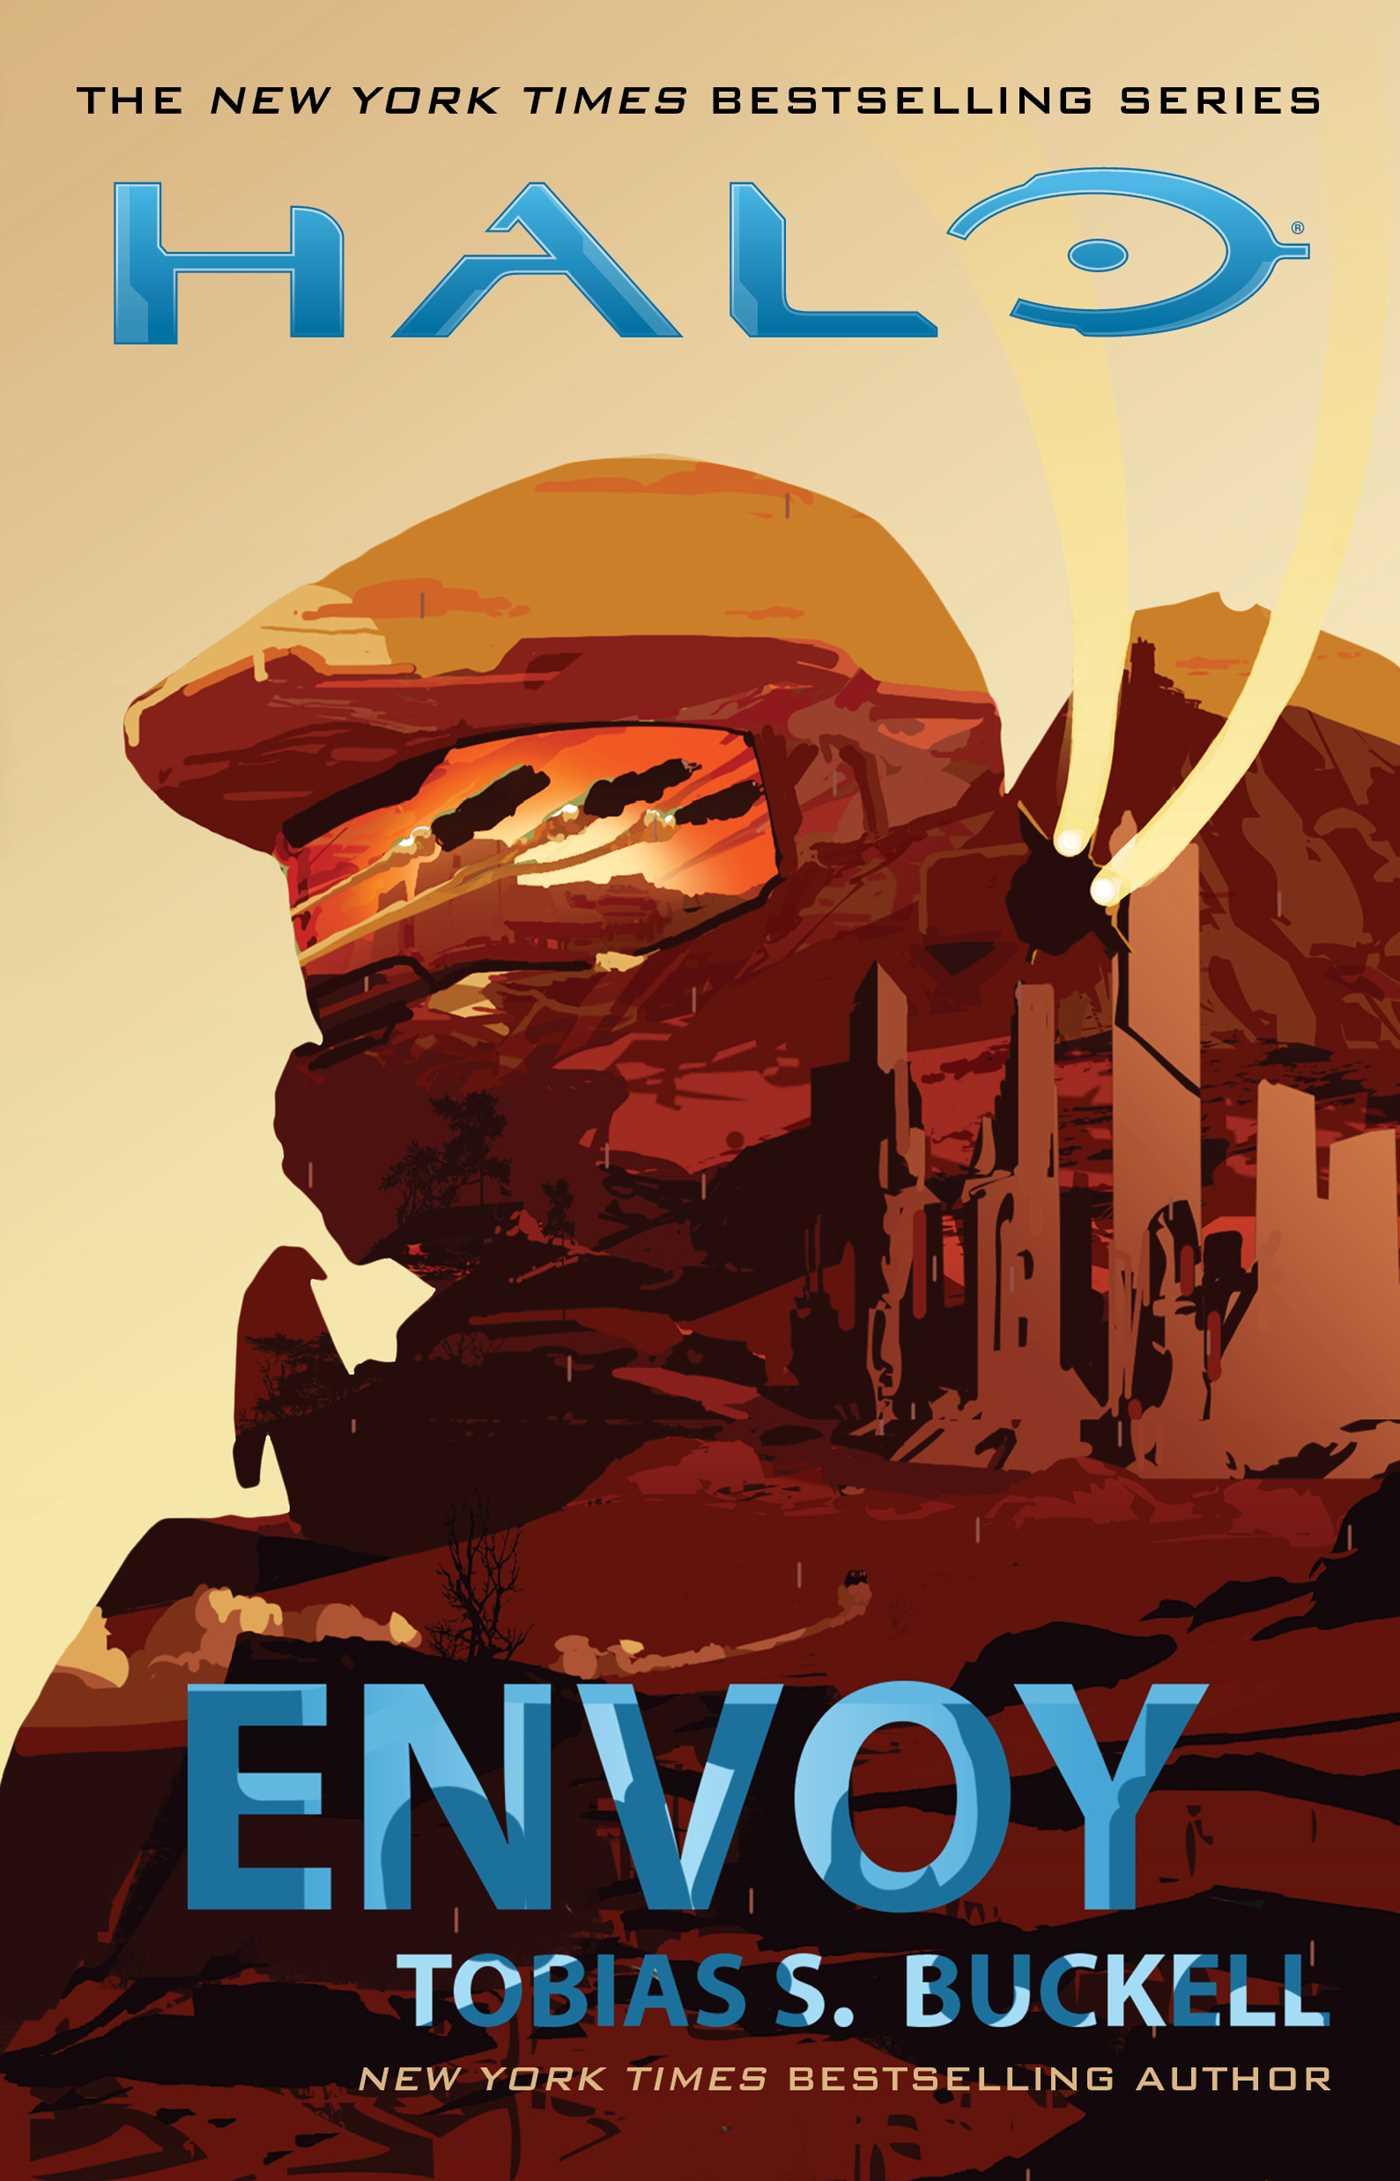 Halo envoy 9781501106873 hr